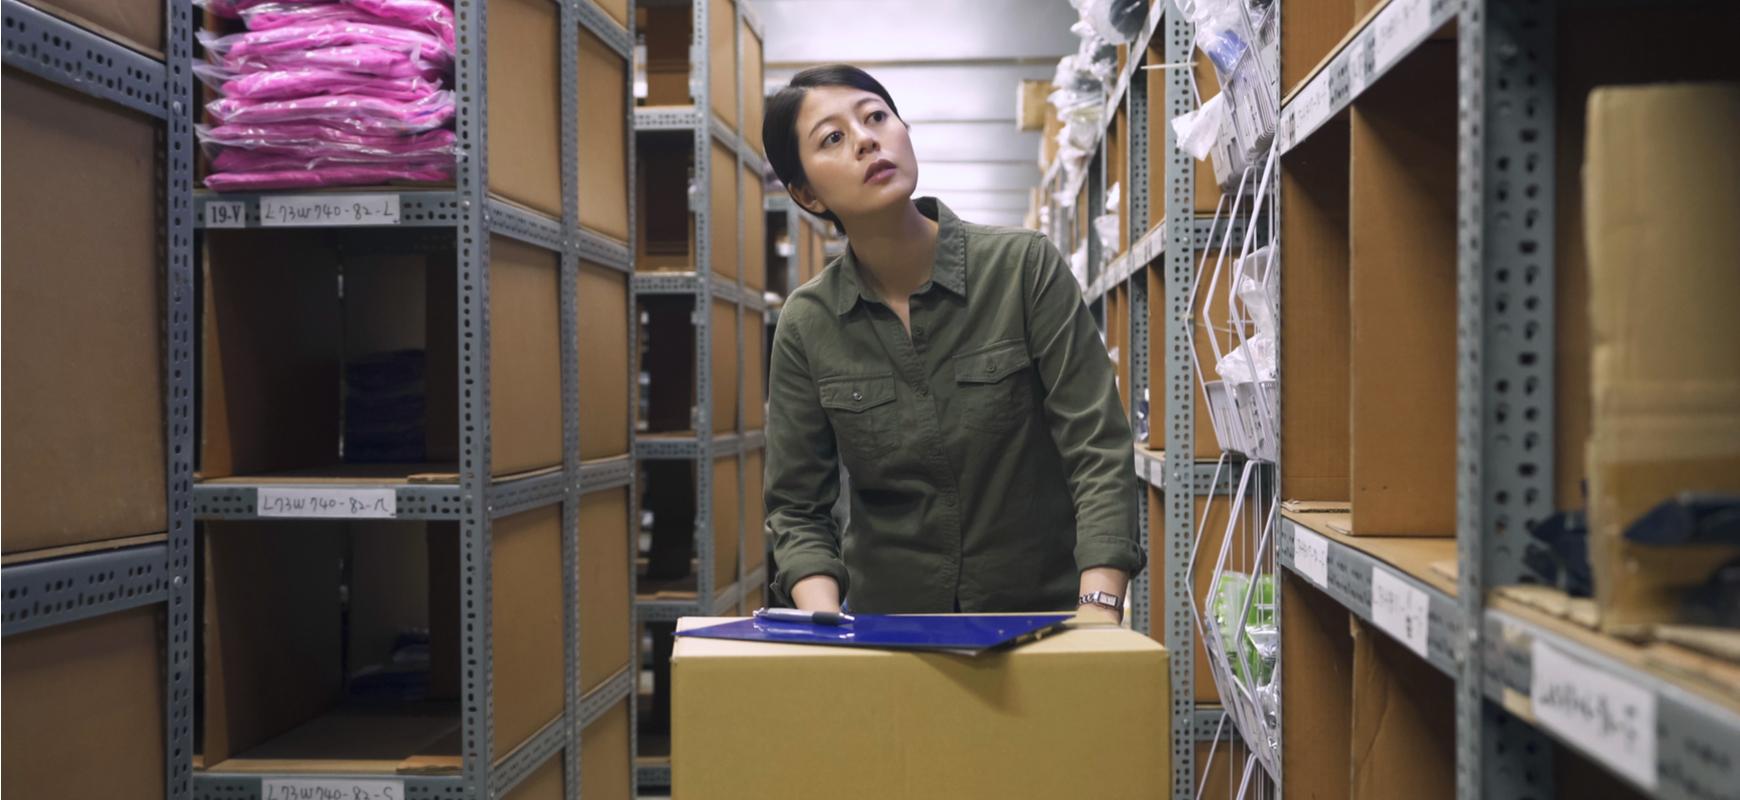 employee pushing boxes in large warehouse